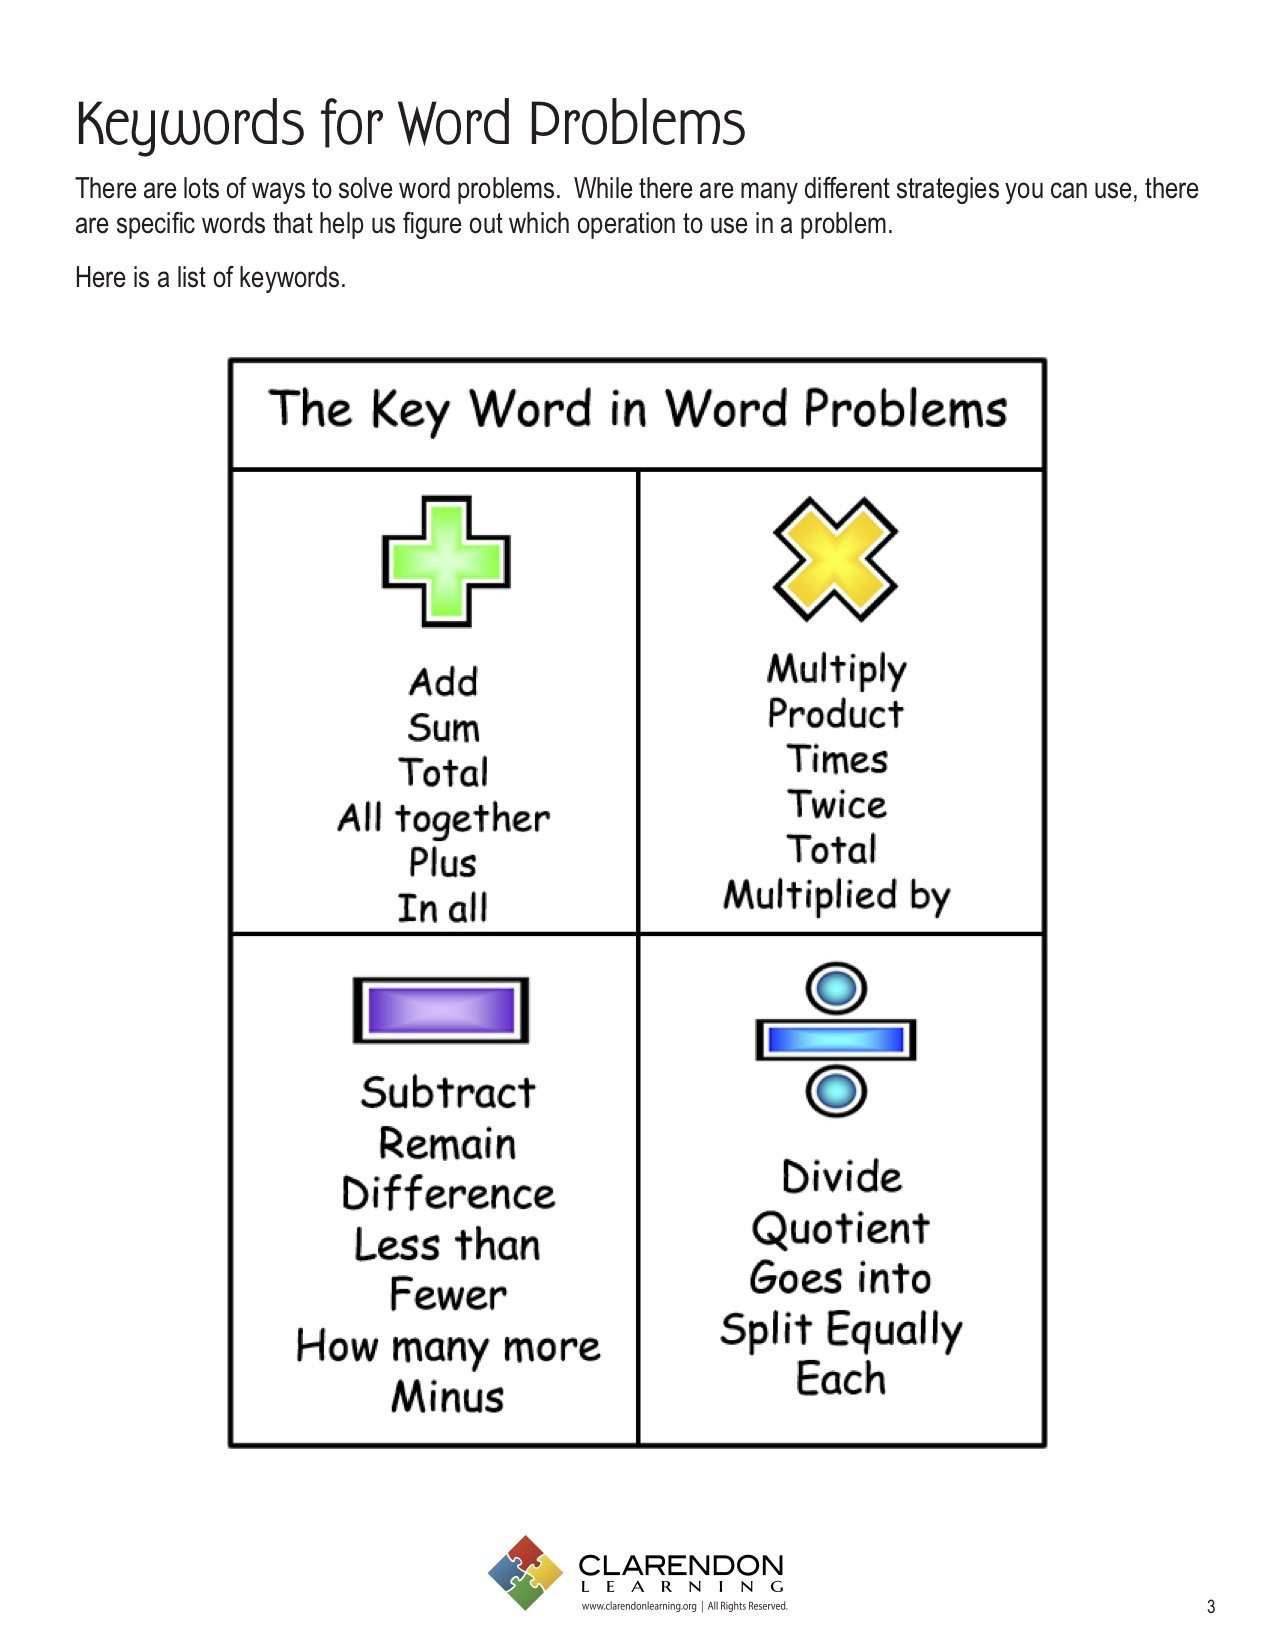 Keywords for Word Problems (Grades 1-3) Lesson Plan ...